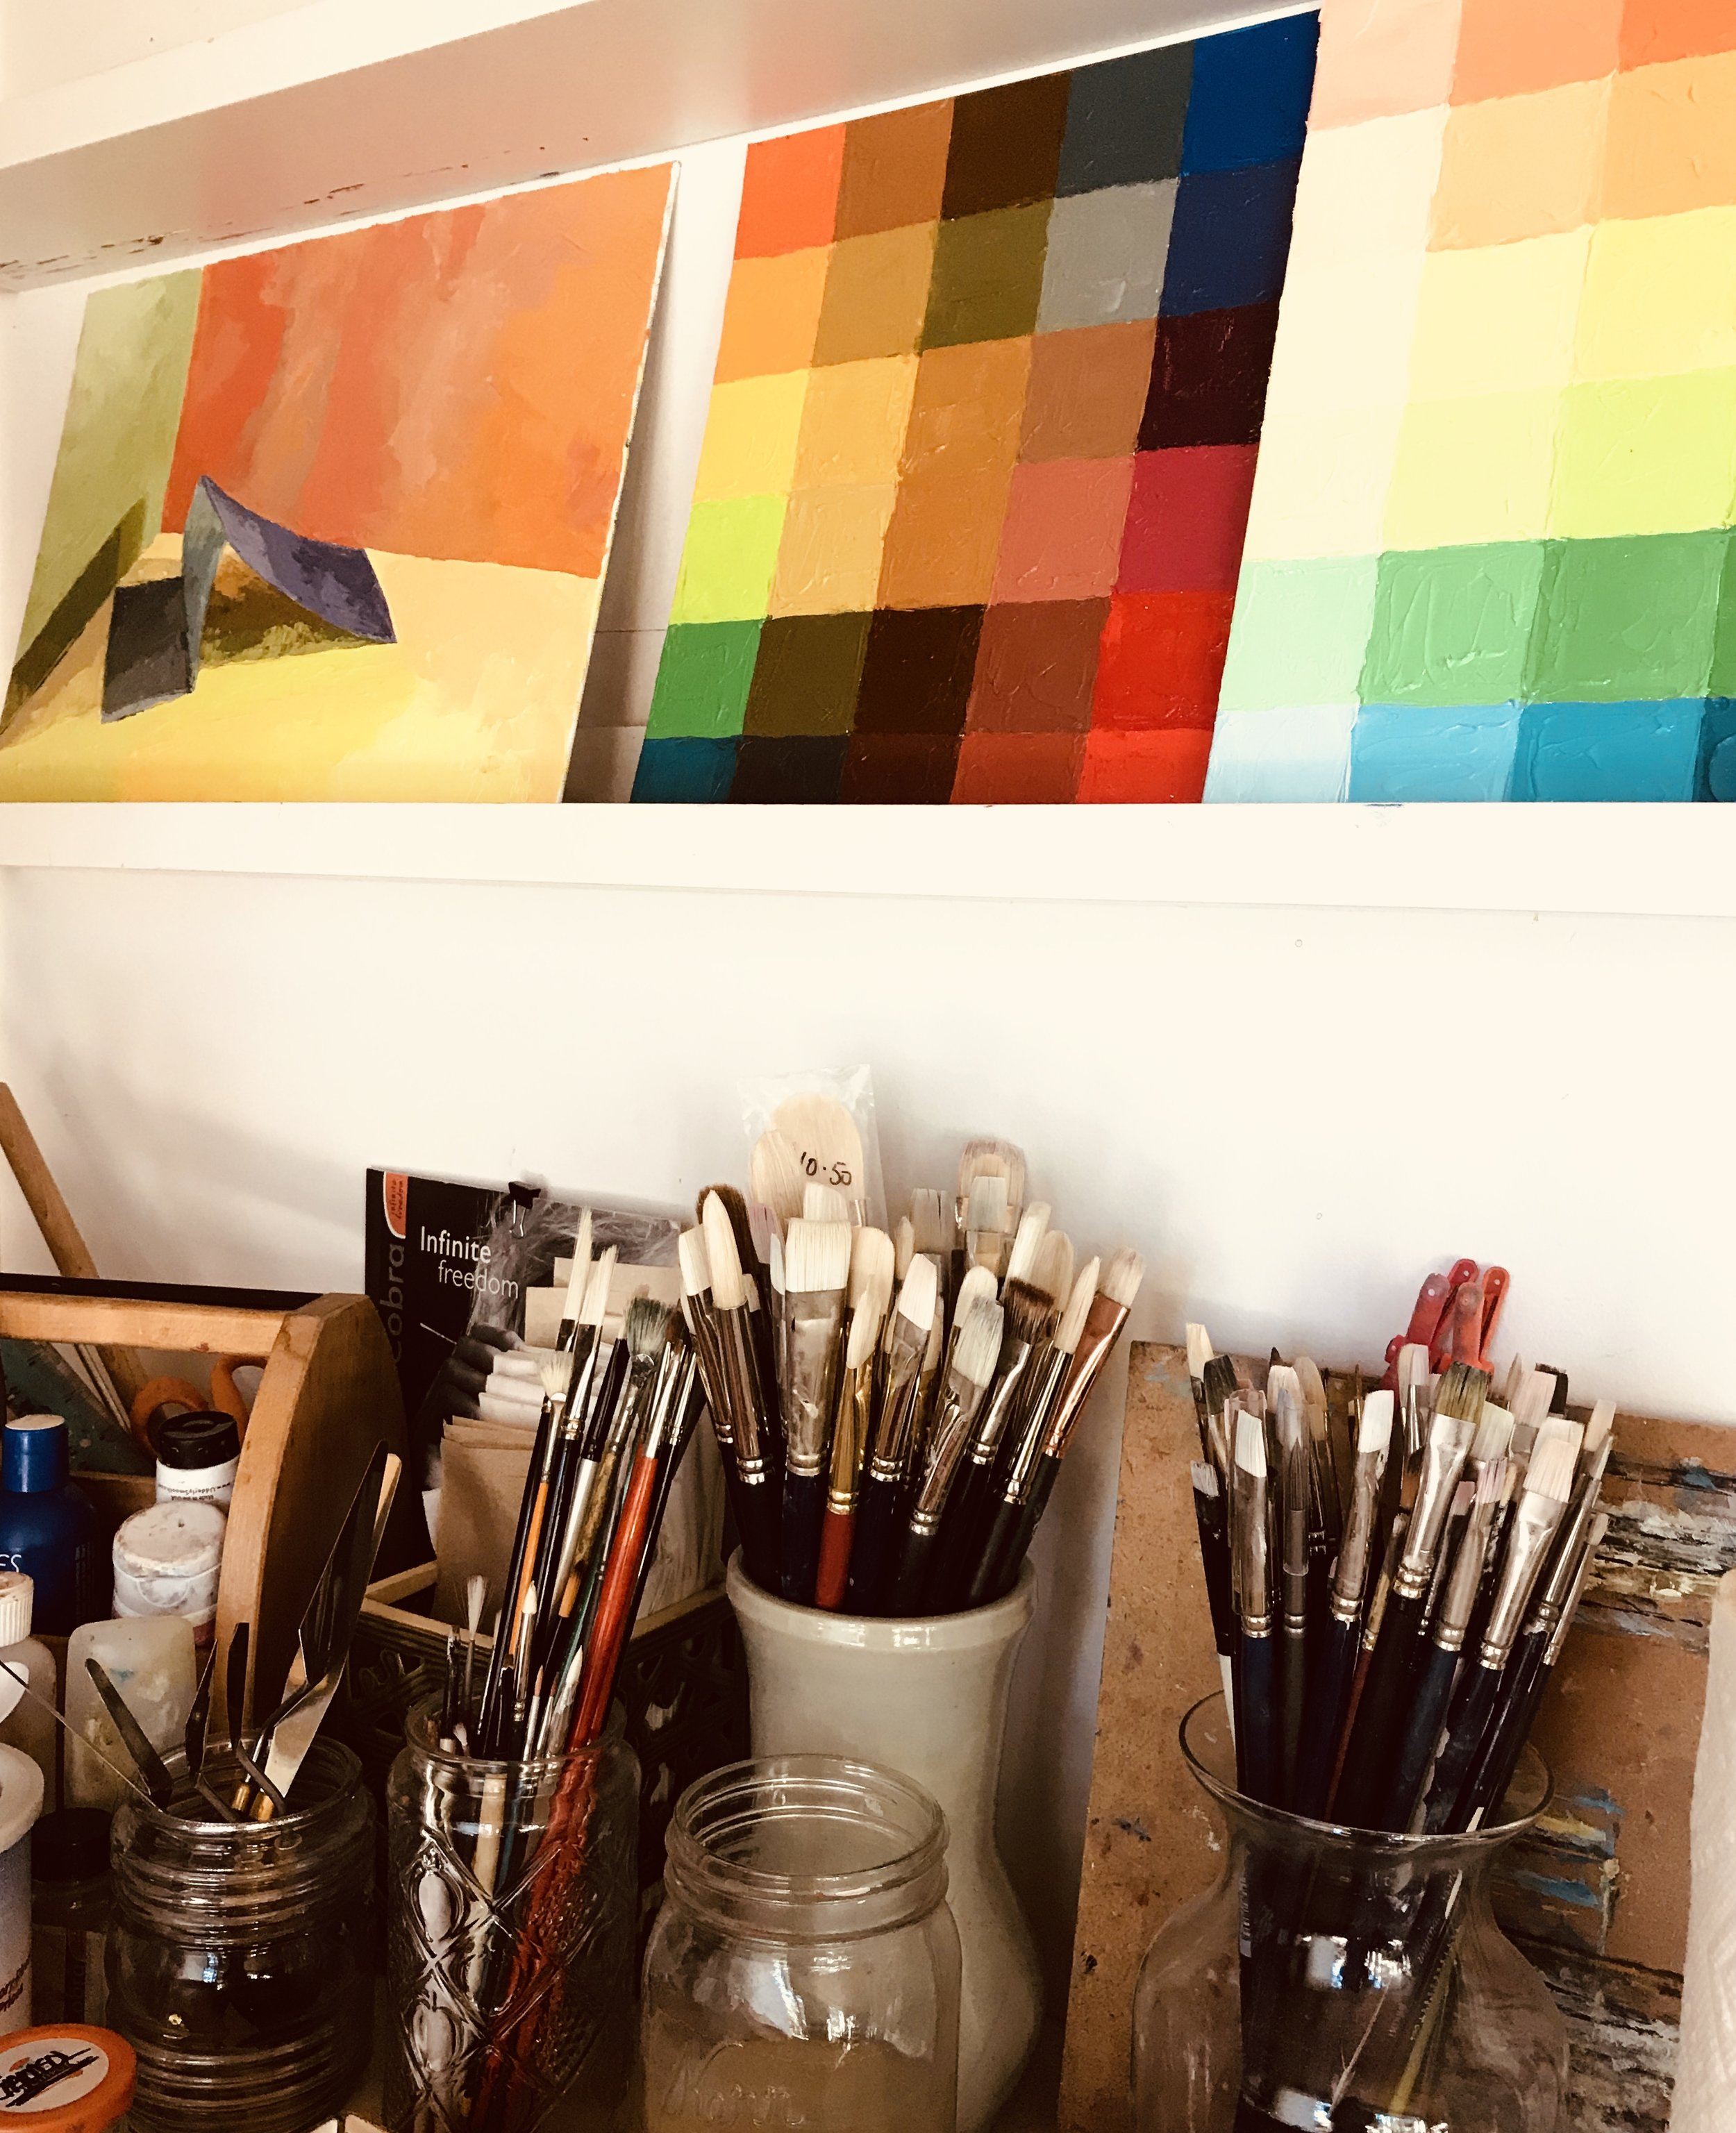 Rebekah's studio space.